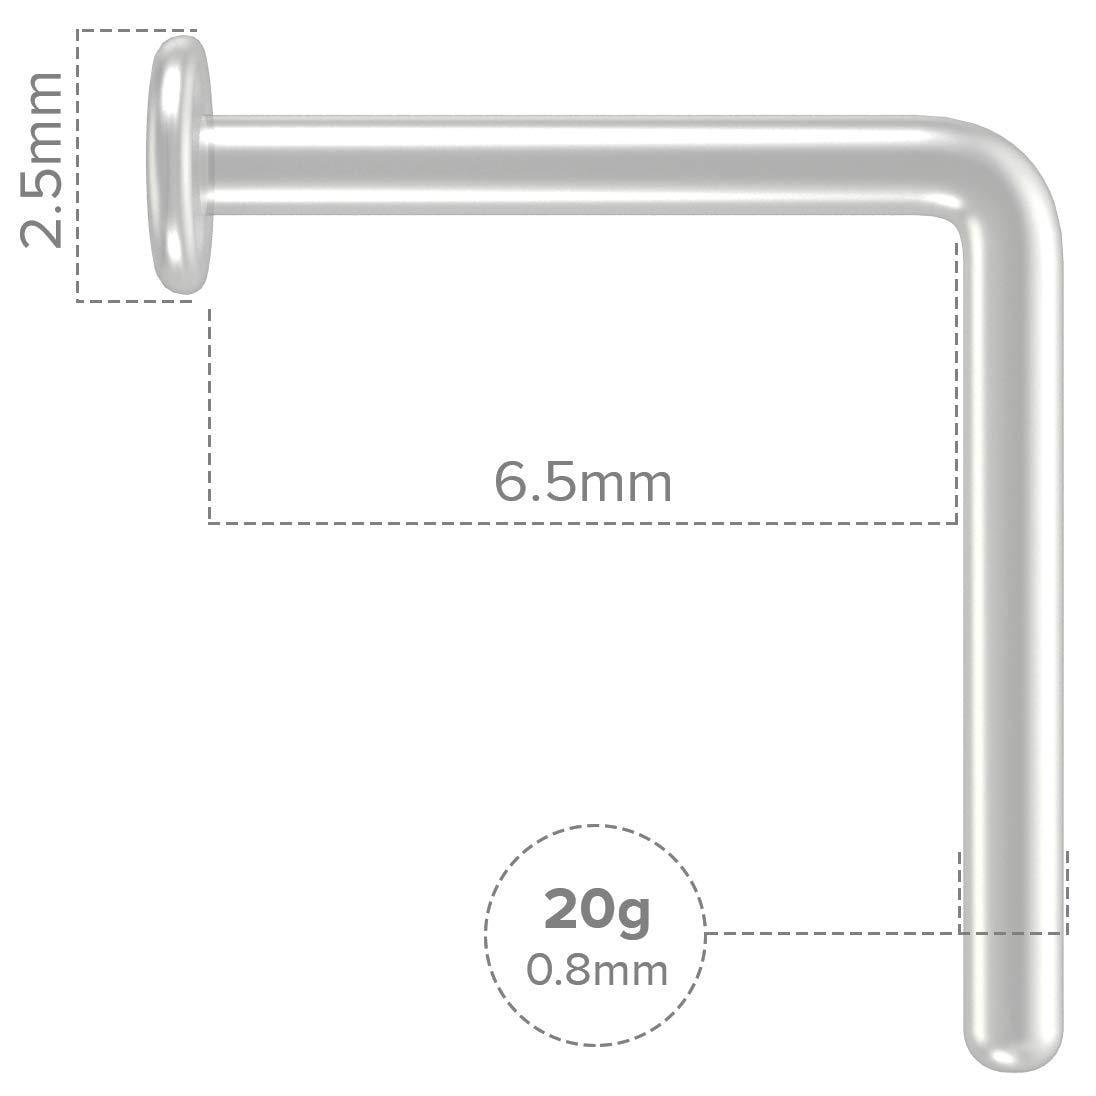 Bling Unique 6pc 20g Nose Piercing Jewelry Clear Retainer Bioflex Flexible Bendable Nostril L-Shaped Screw Stud